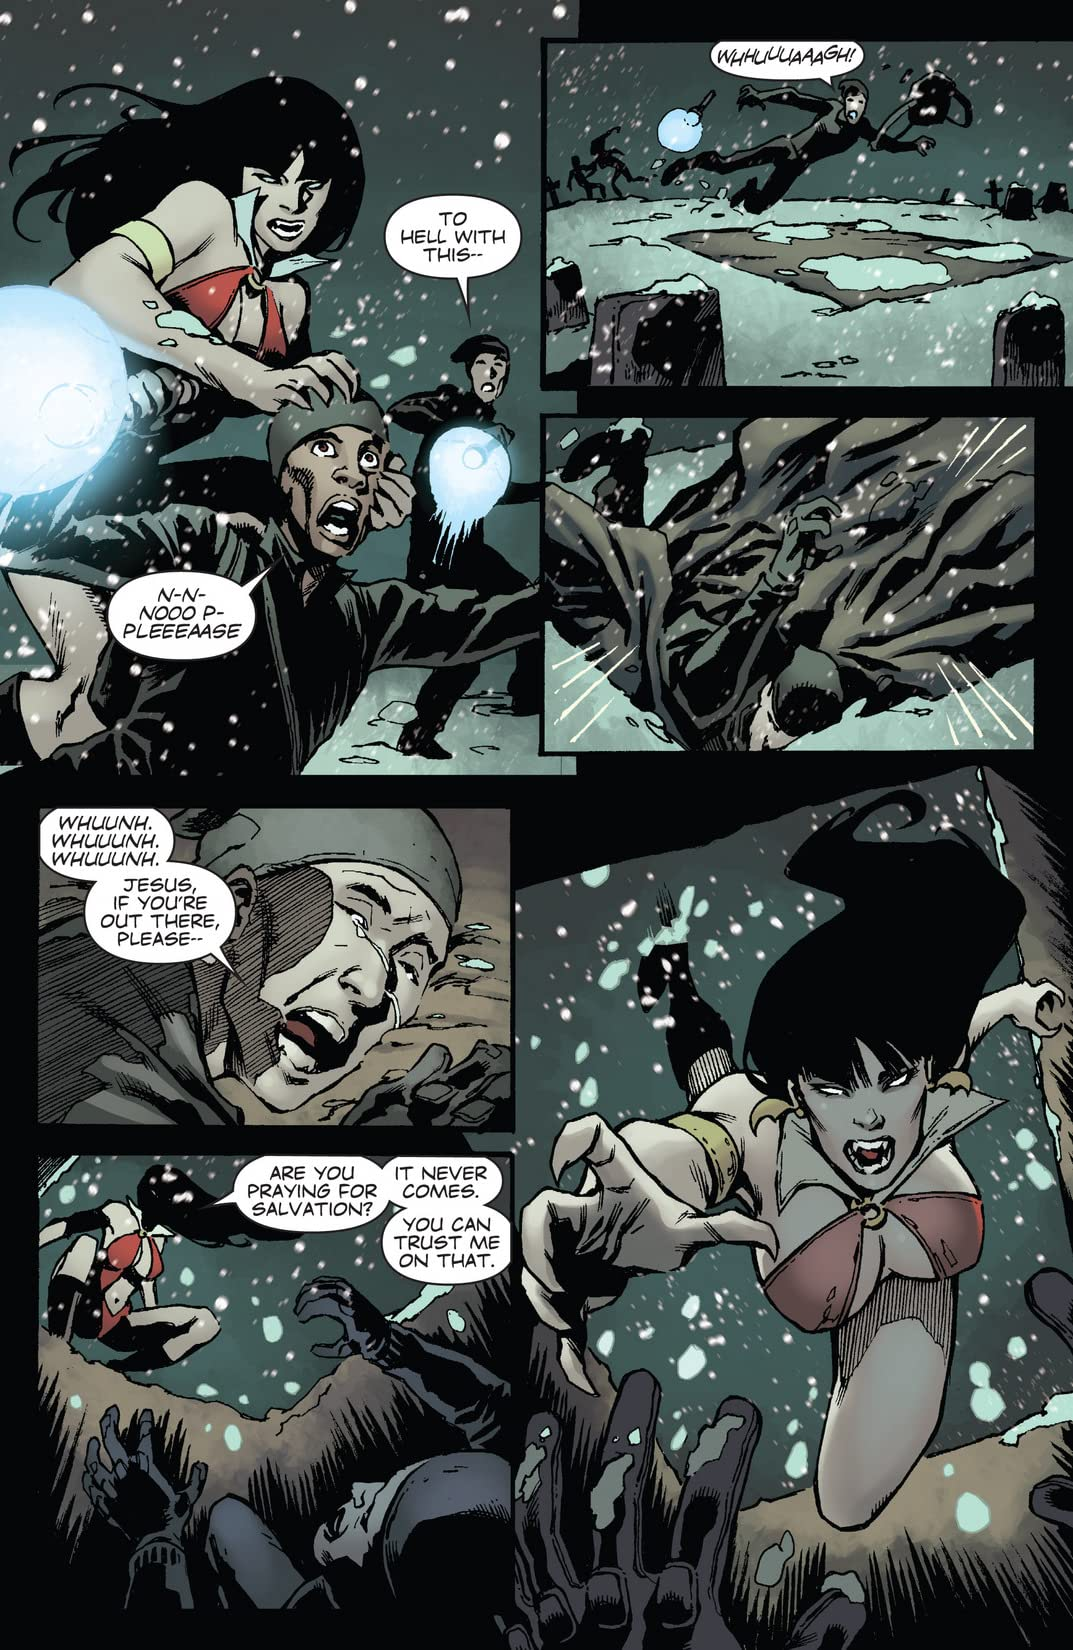 Vampirella #26